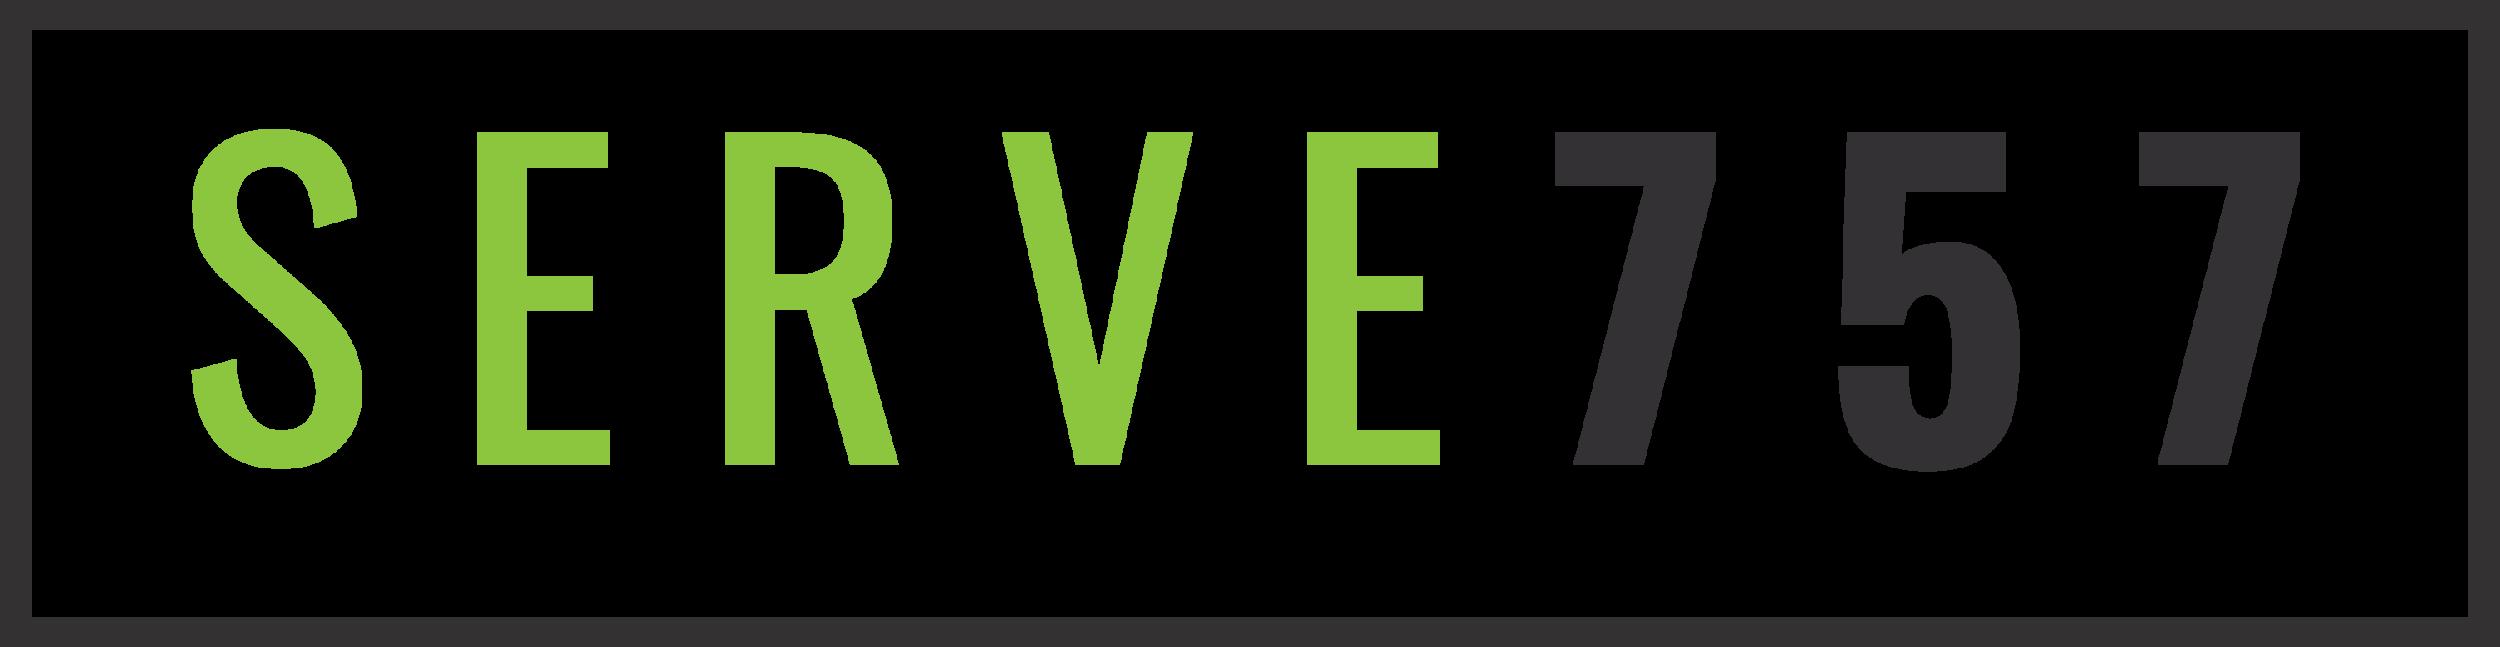 Serve757_Logo.png